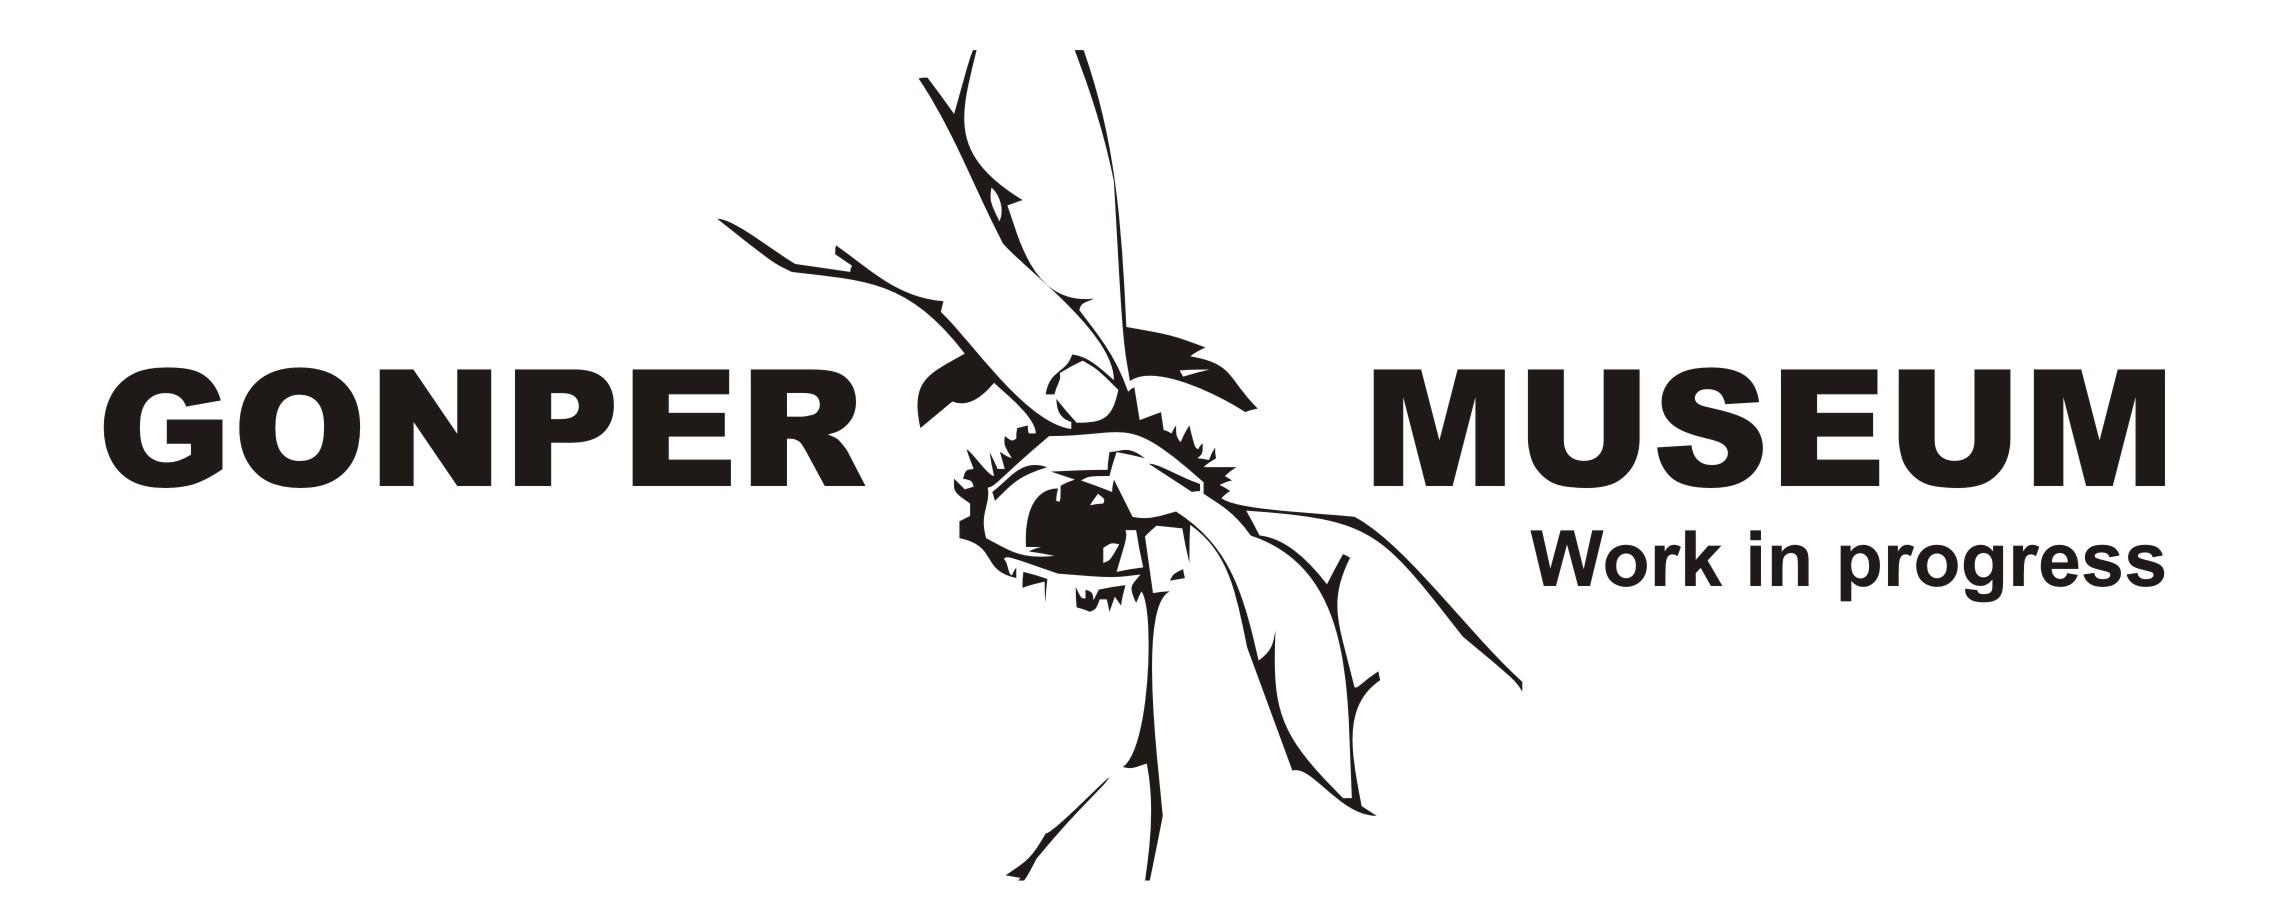 Gonper Museum logo